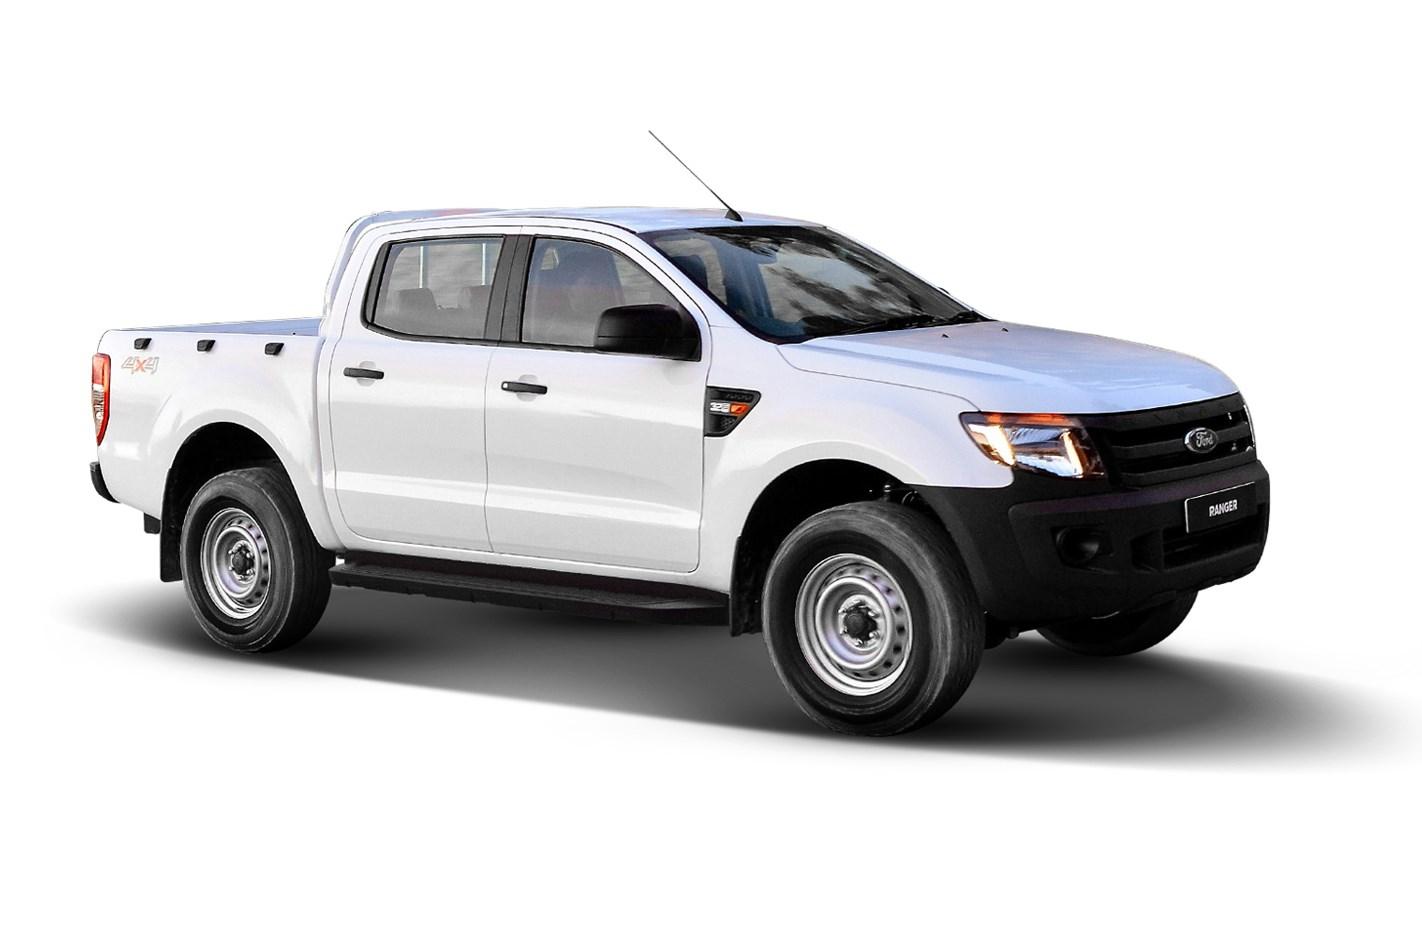 2015 Ford Ranger XL 32 4x4 Dual Cab Utility